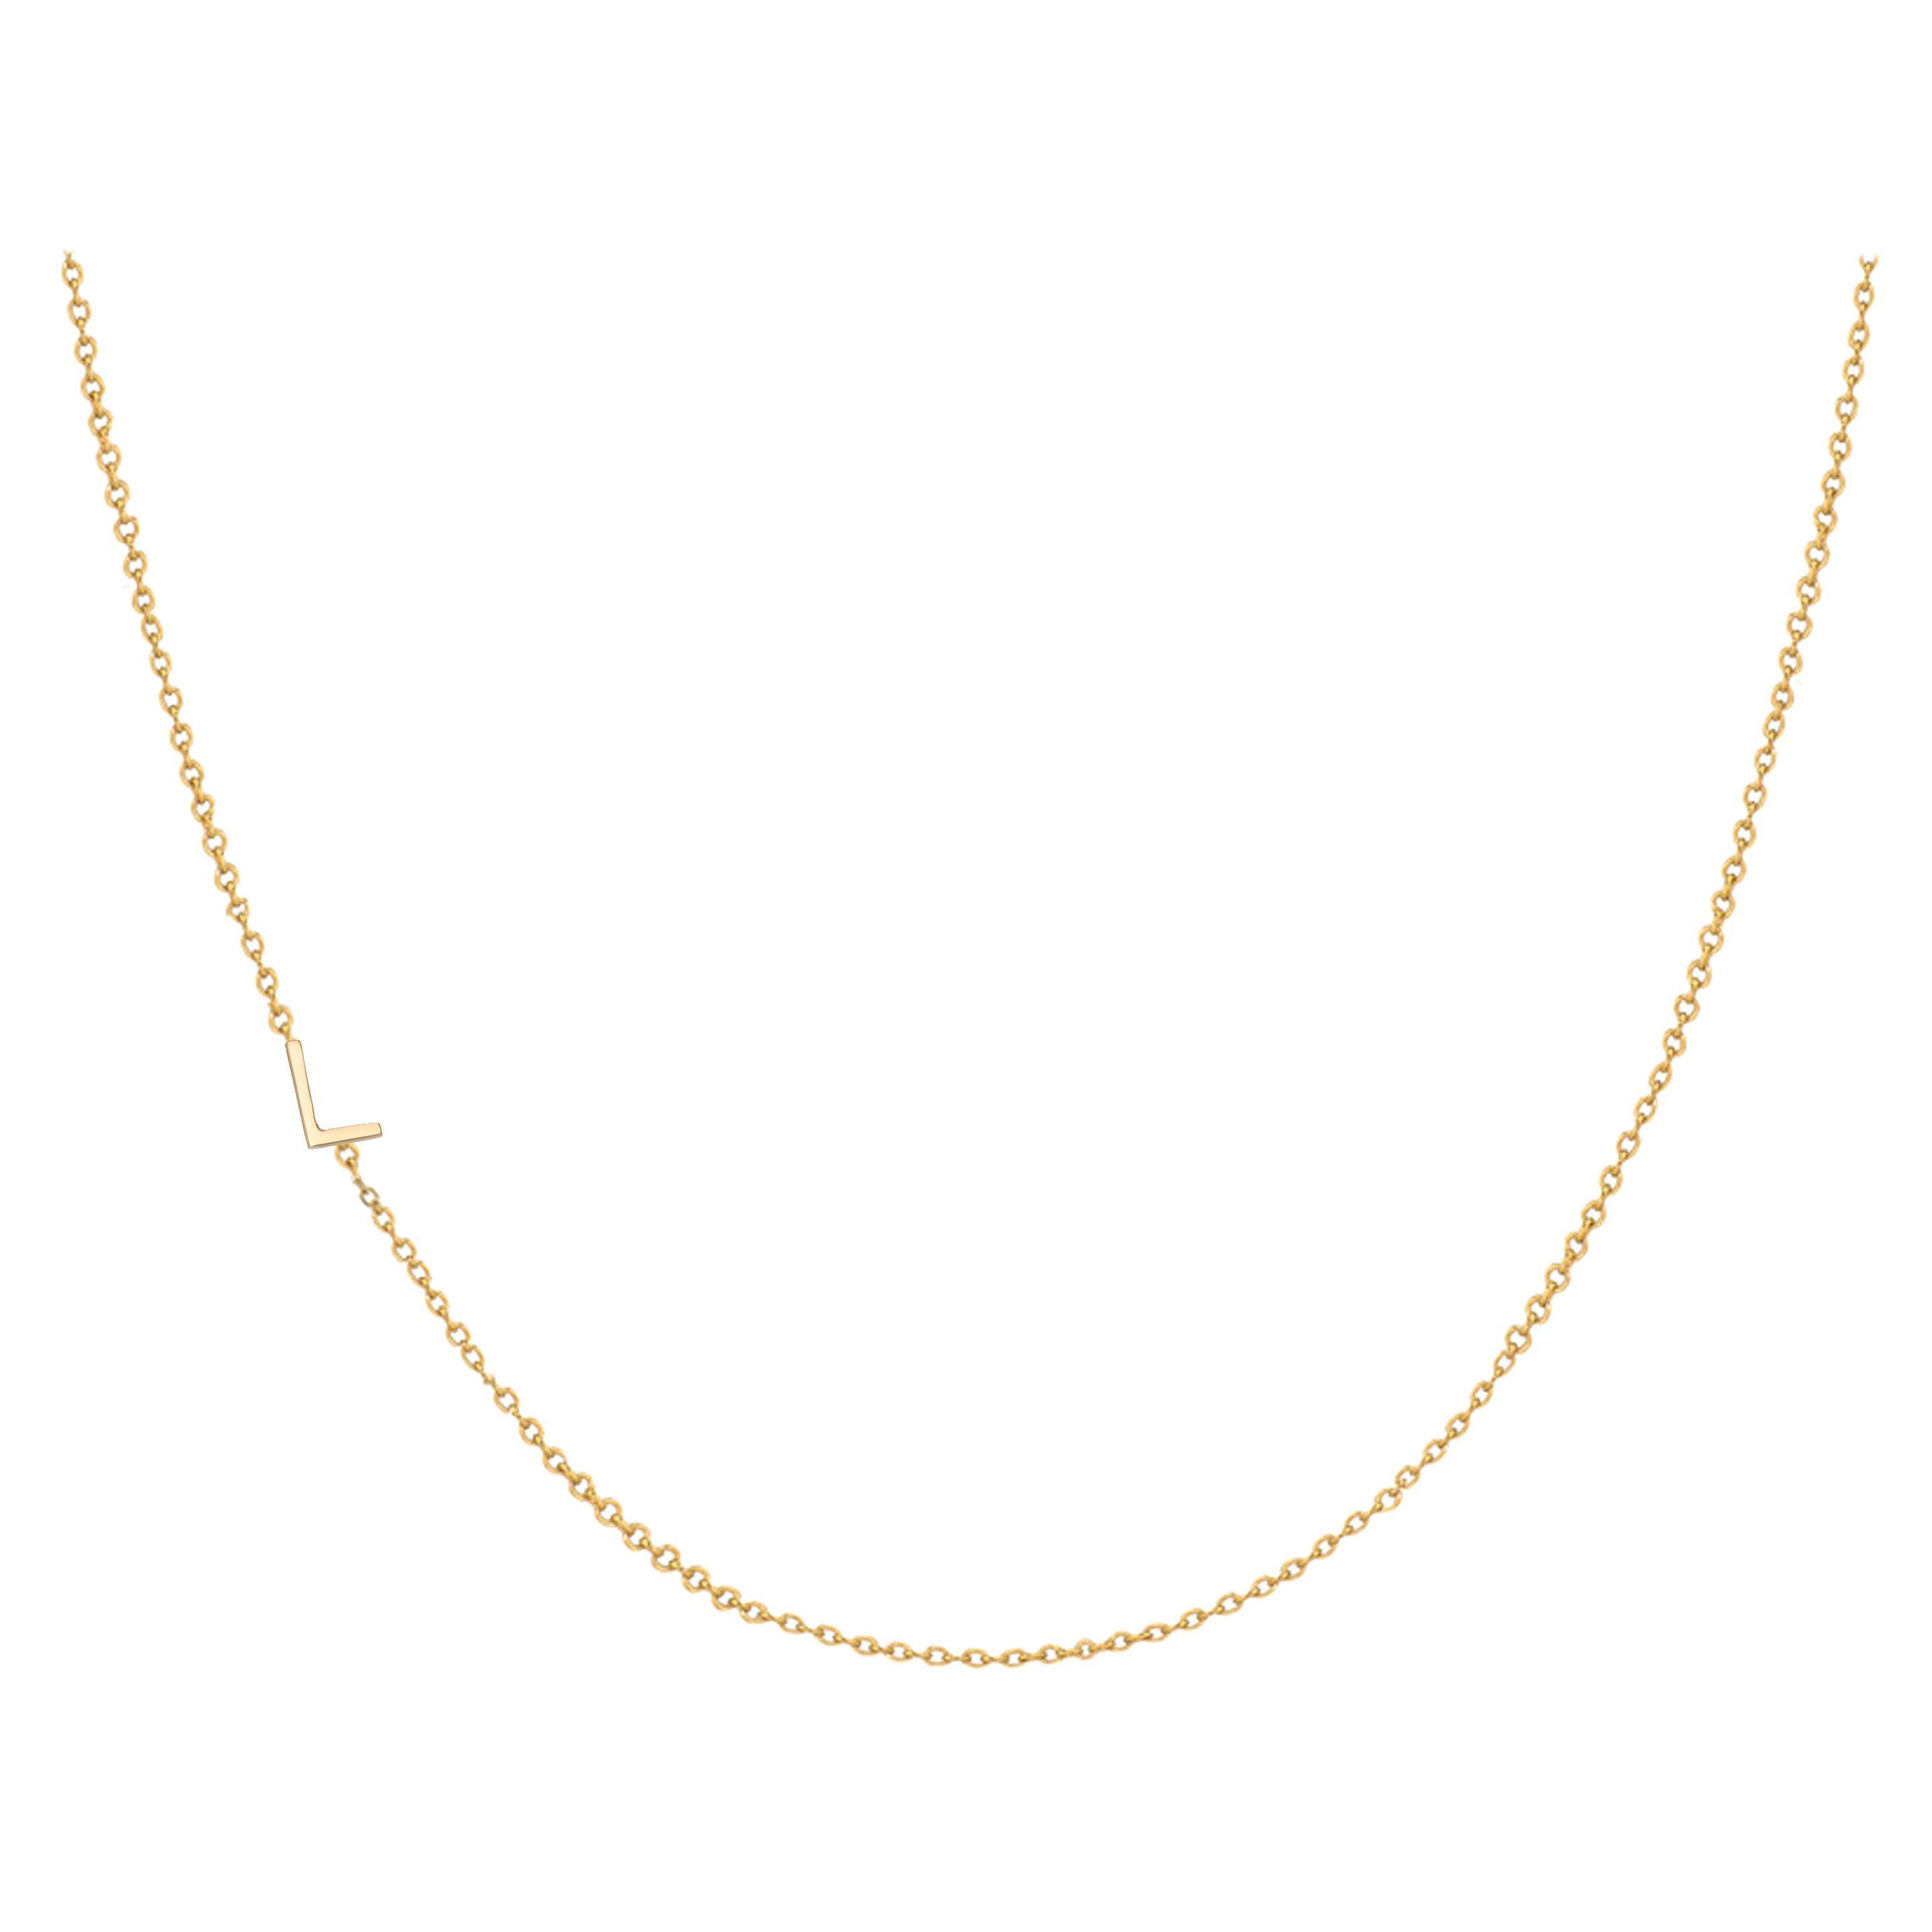 14 Karat Gold Asymmetrical Initial Necklace, L